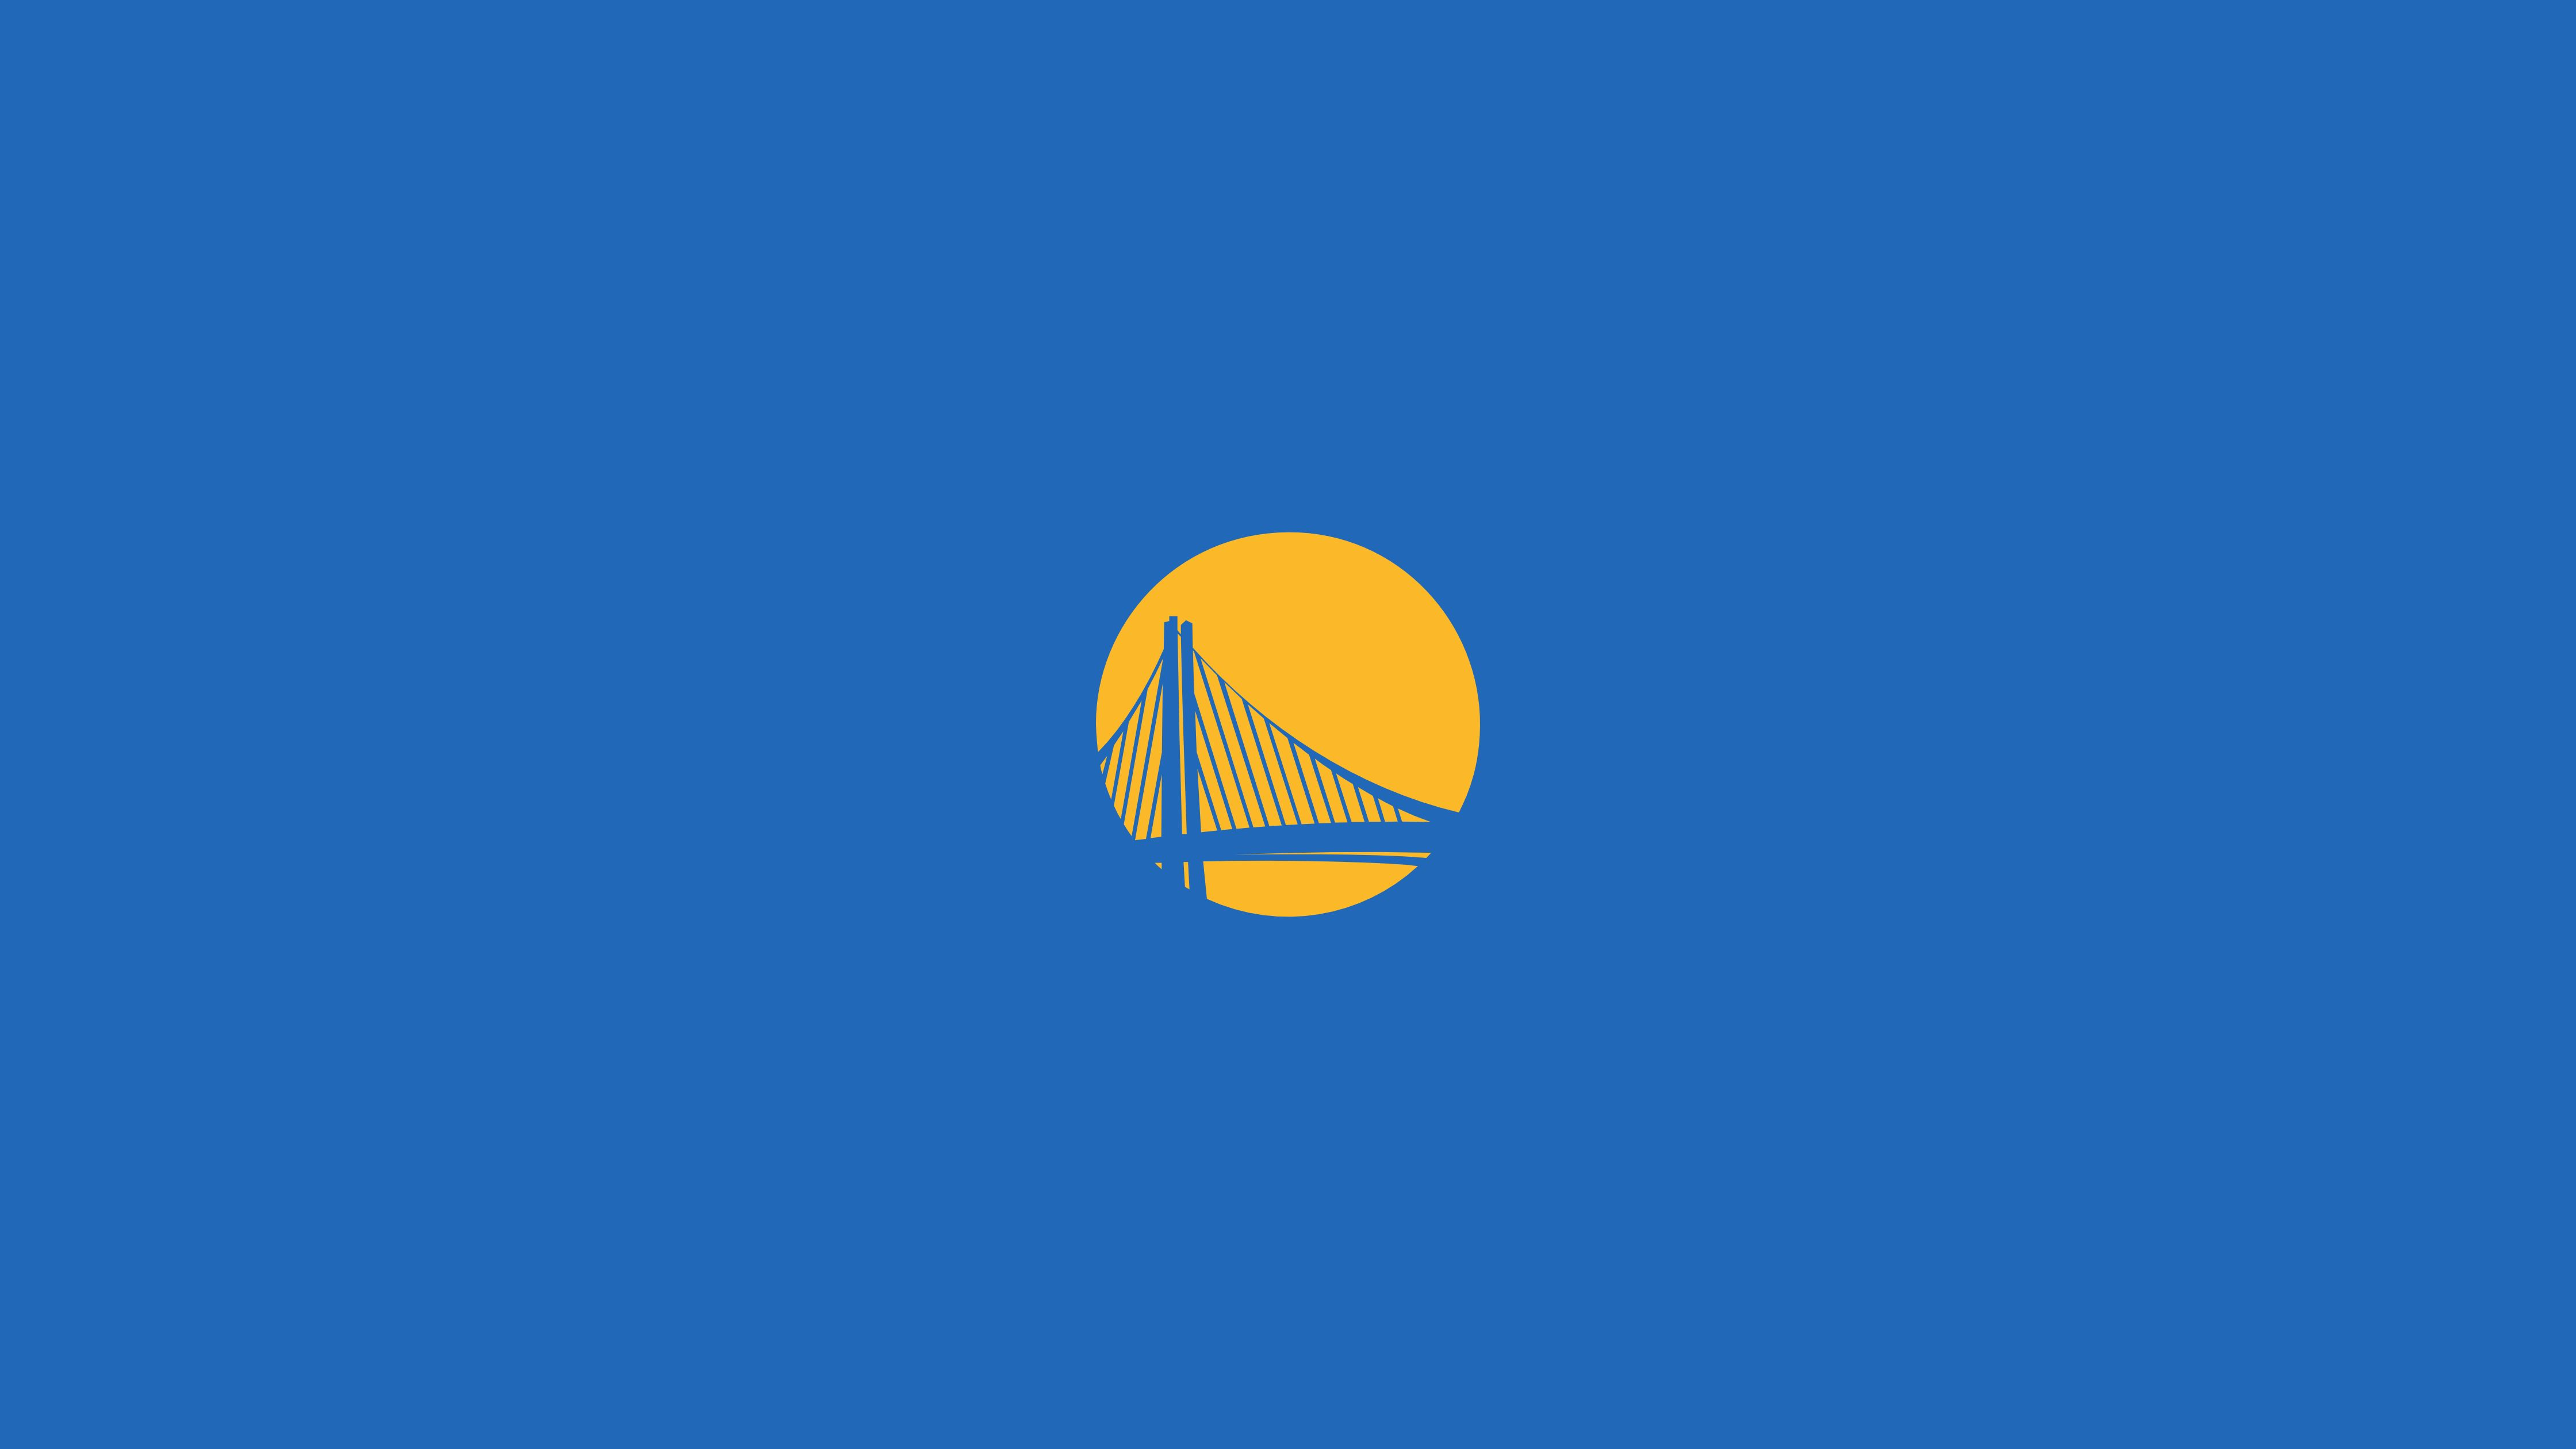 Golden State Warriors Desktop Background In 2020 Desktop Wallpapers Backgrounds Backgrounds Desktop Nba Background